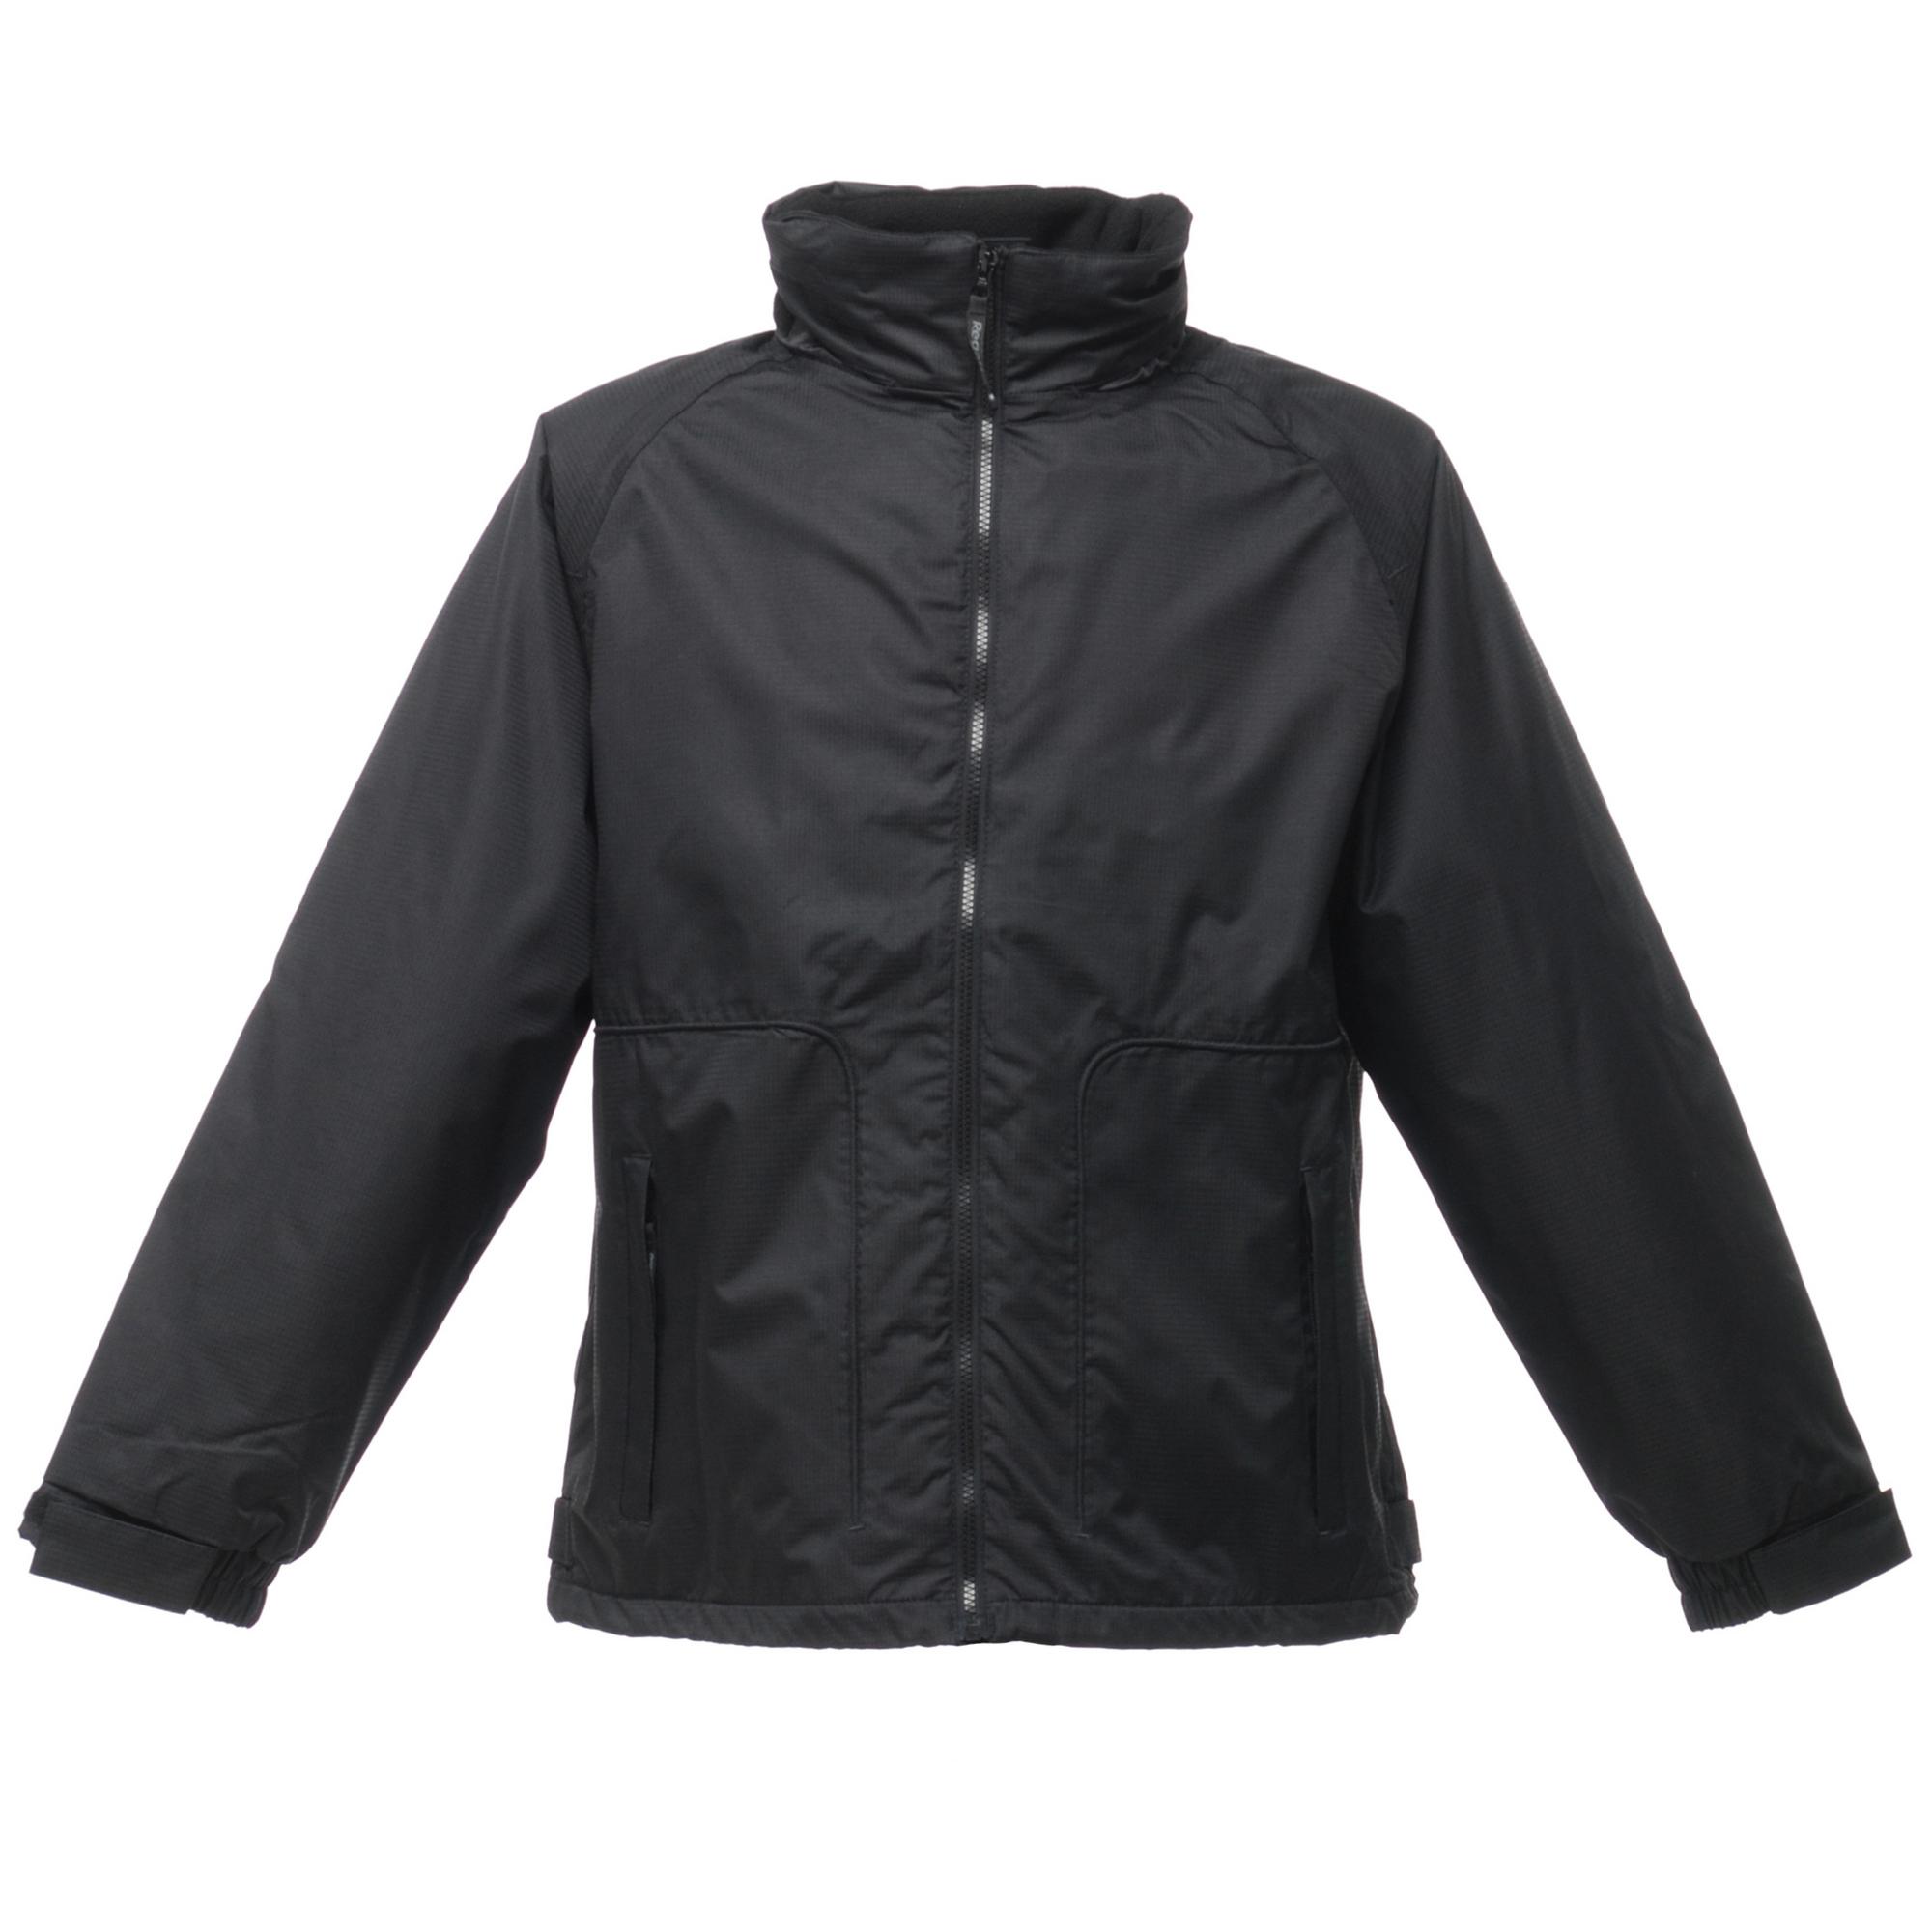 Regatta Mens Waterproof Windproof Jacket (Fleece Lined) (S) (Black)